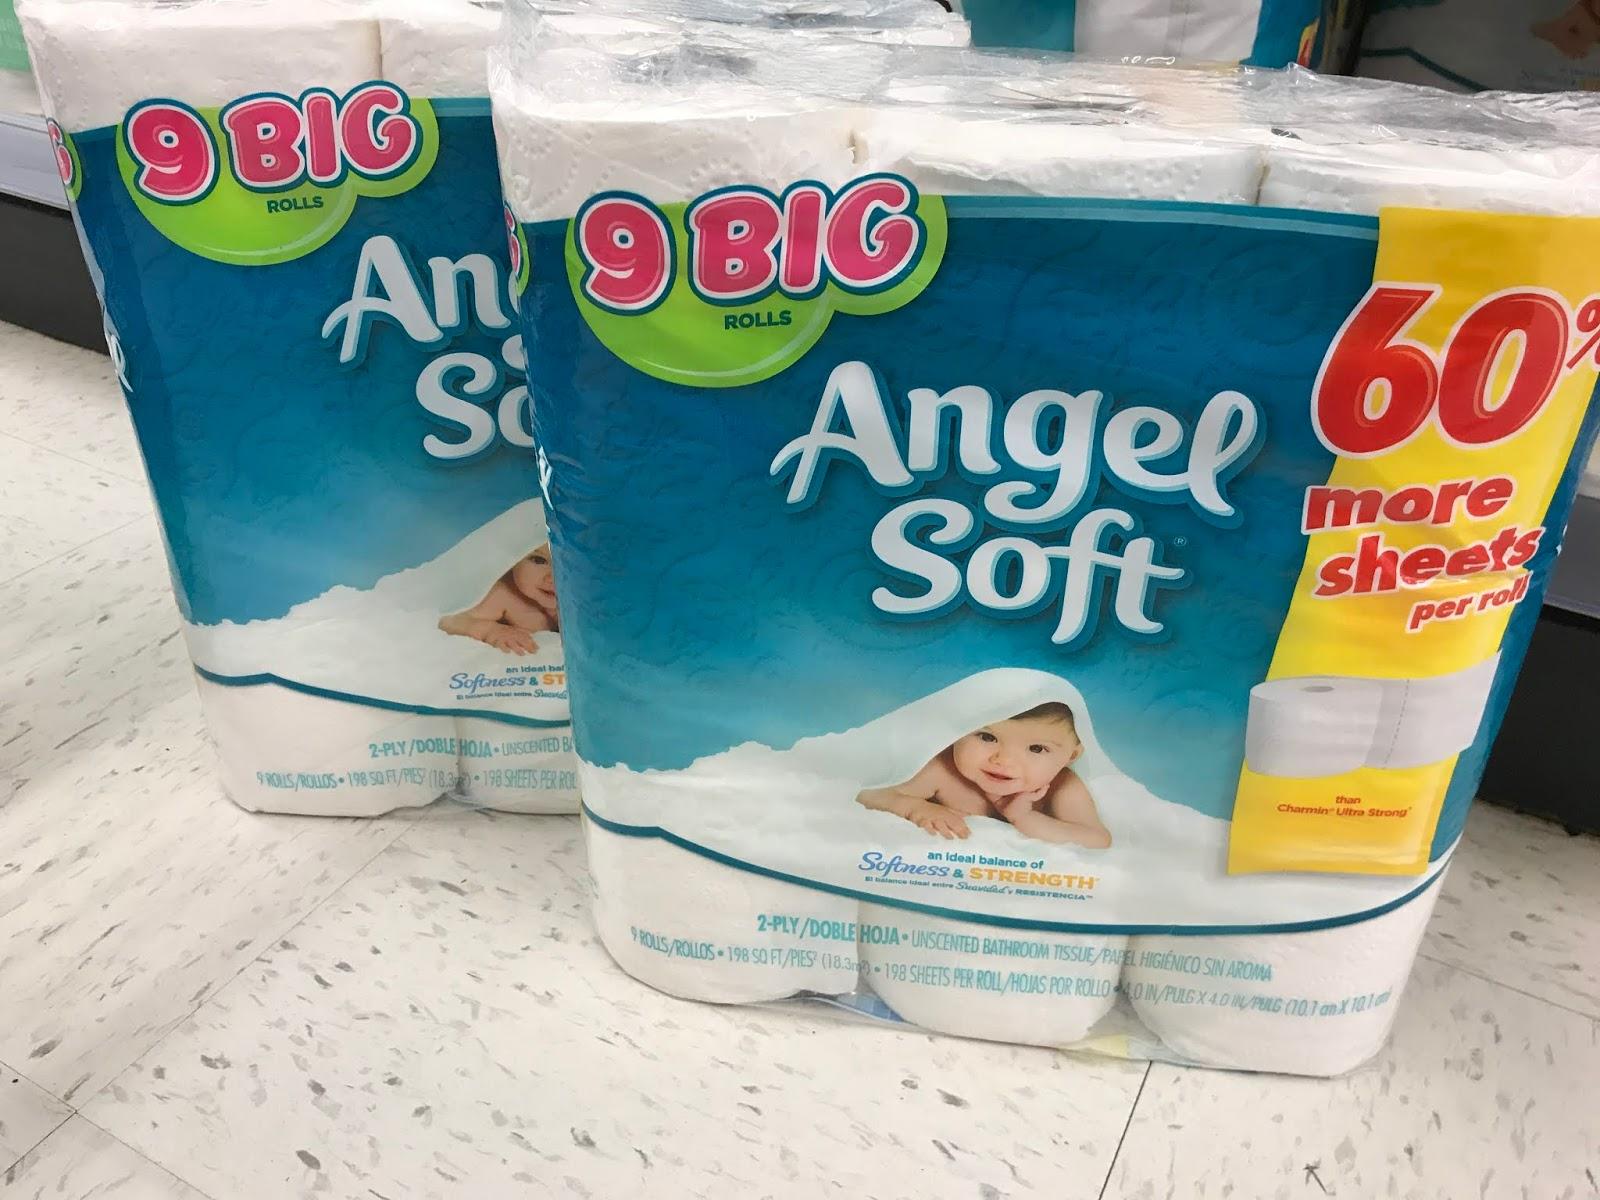 Walgreens 2 49 Angel Soft Toilet Paper Comes Back Again